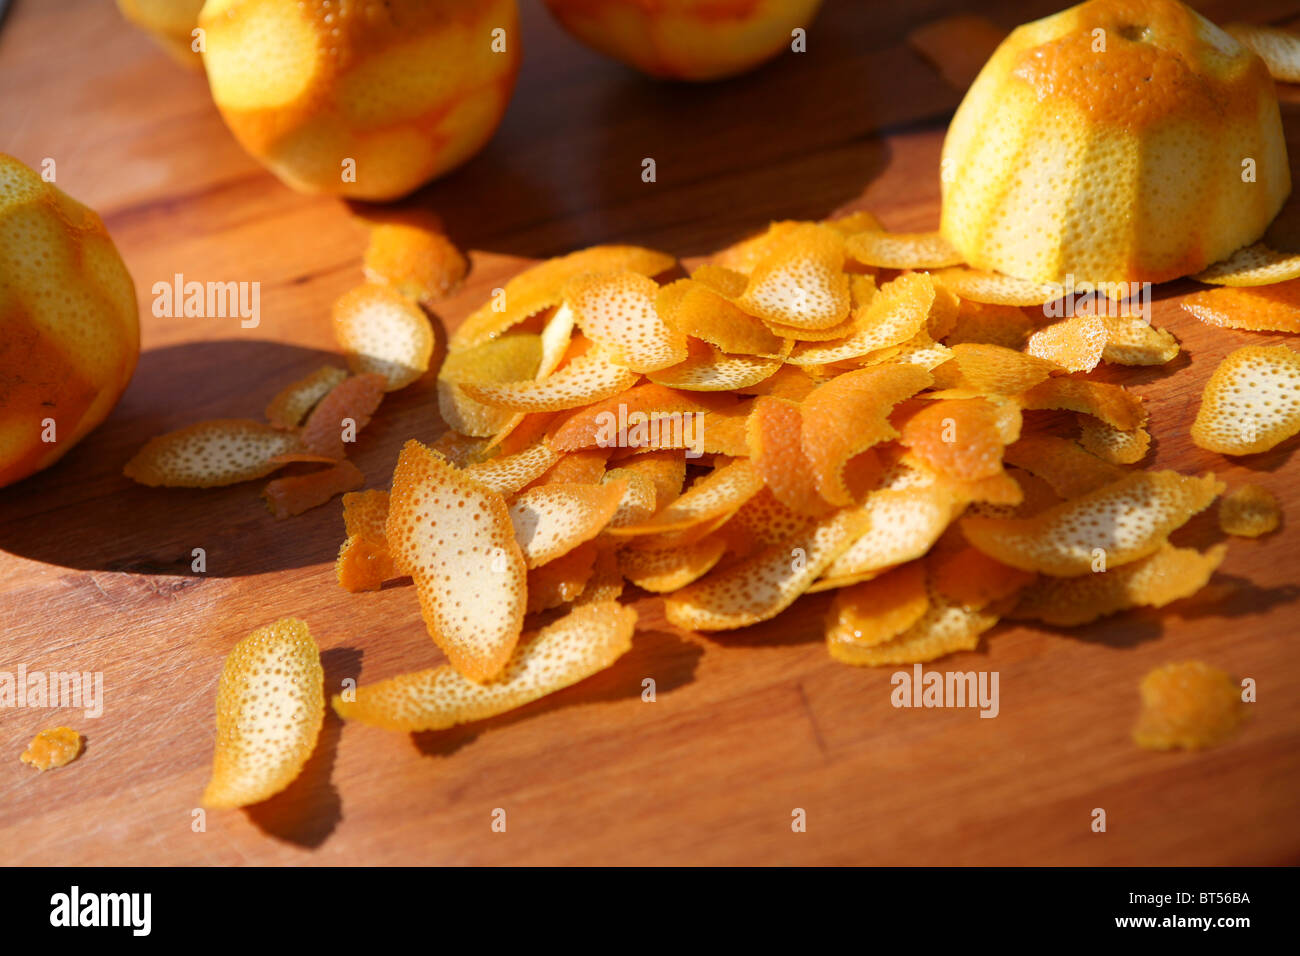 Montón de cáscara de naranja sobre una tabla de cortar de madera, exterior. Imagen De Stock